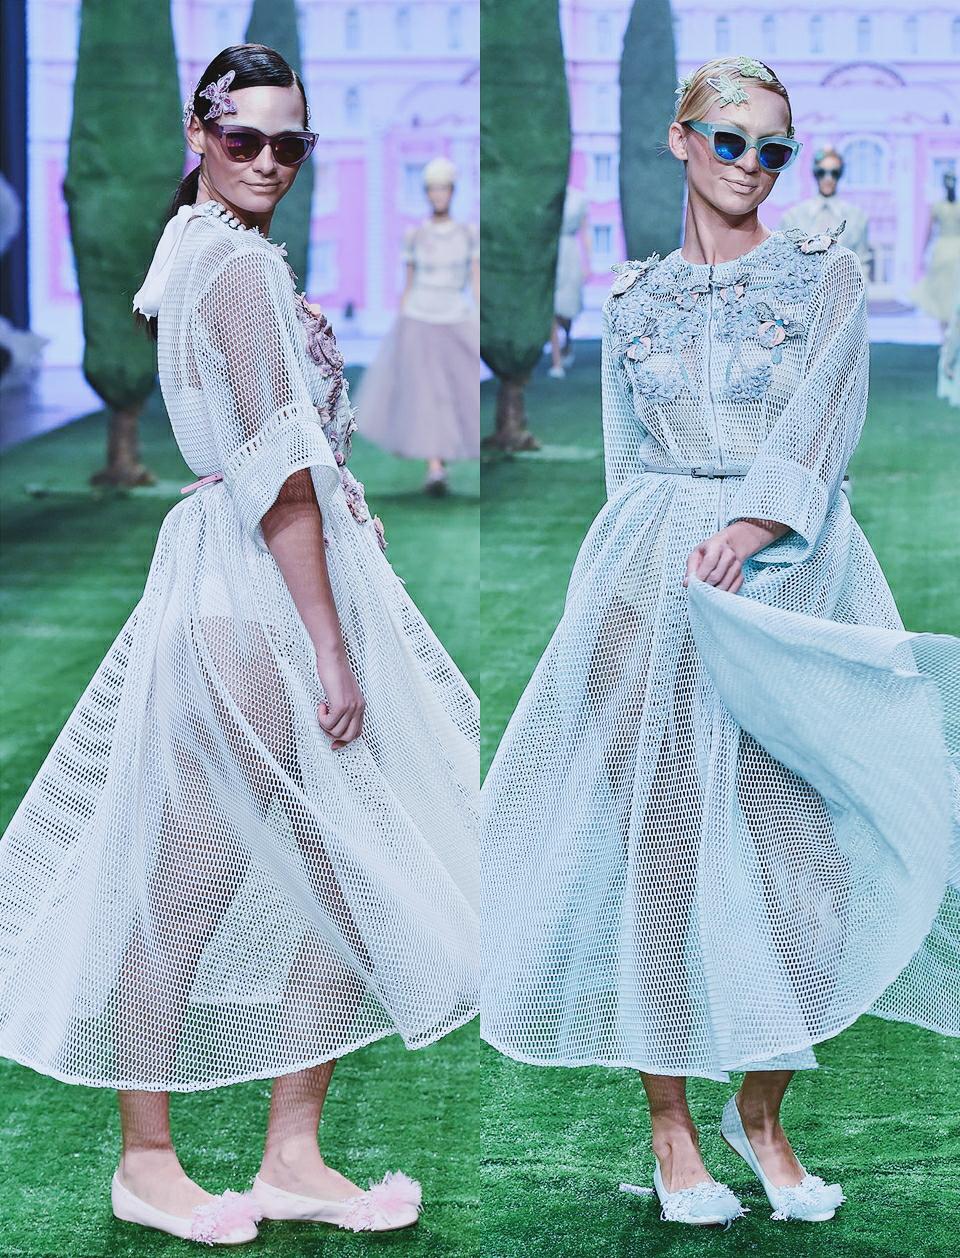 Amato Filipino fashion designer